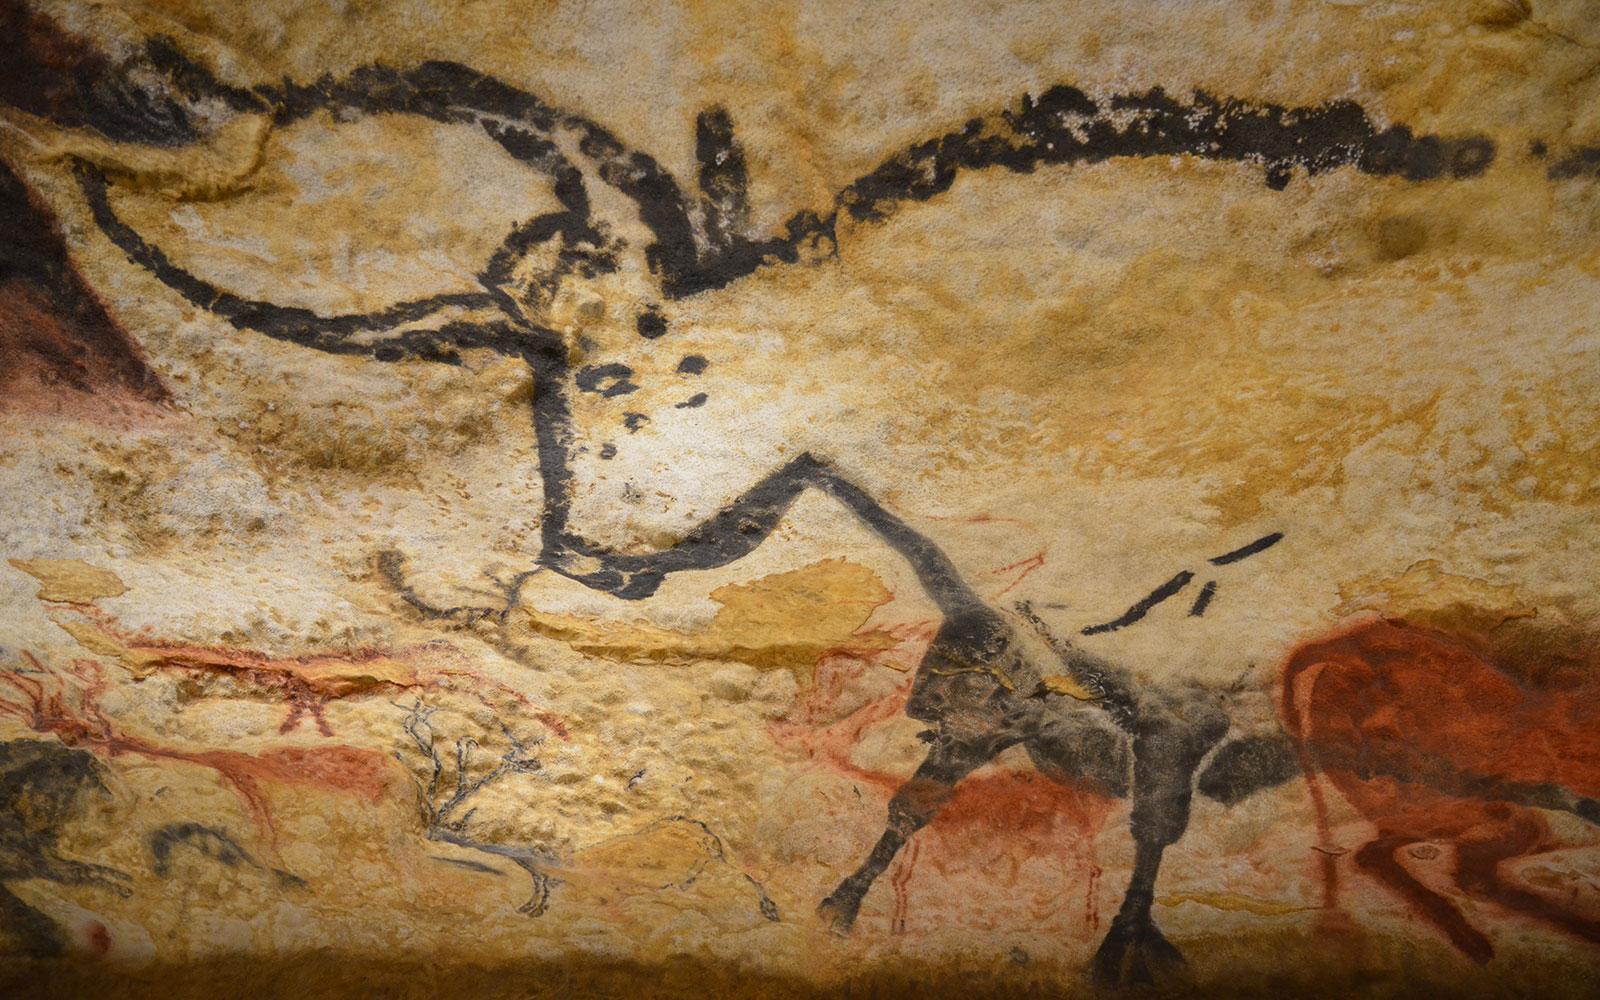 Paleolitska pećina Lasko